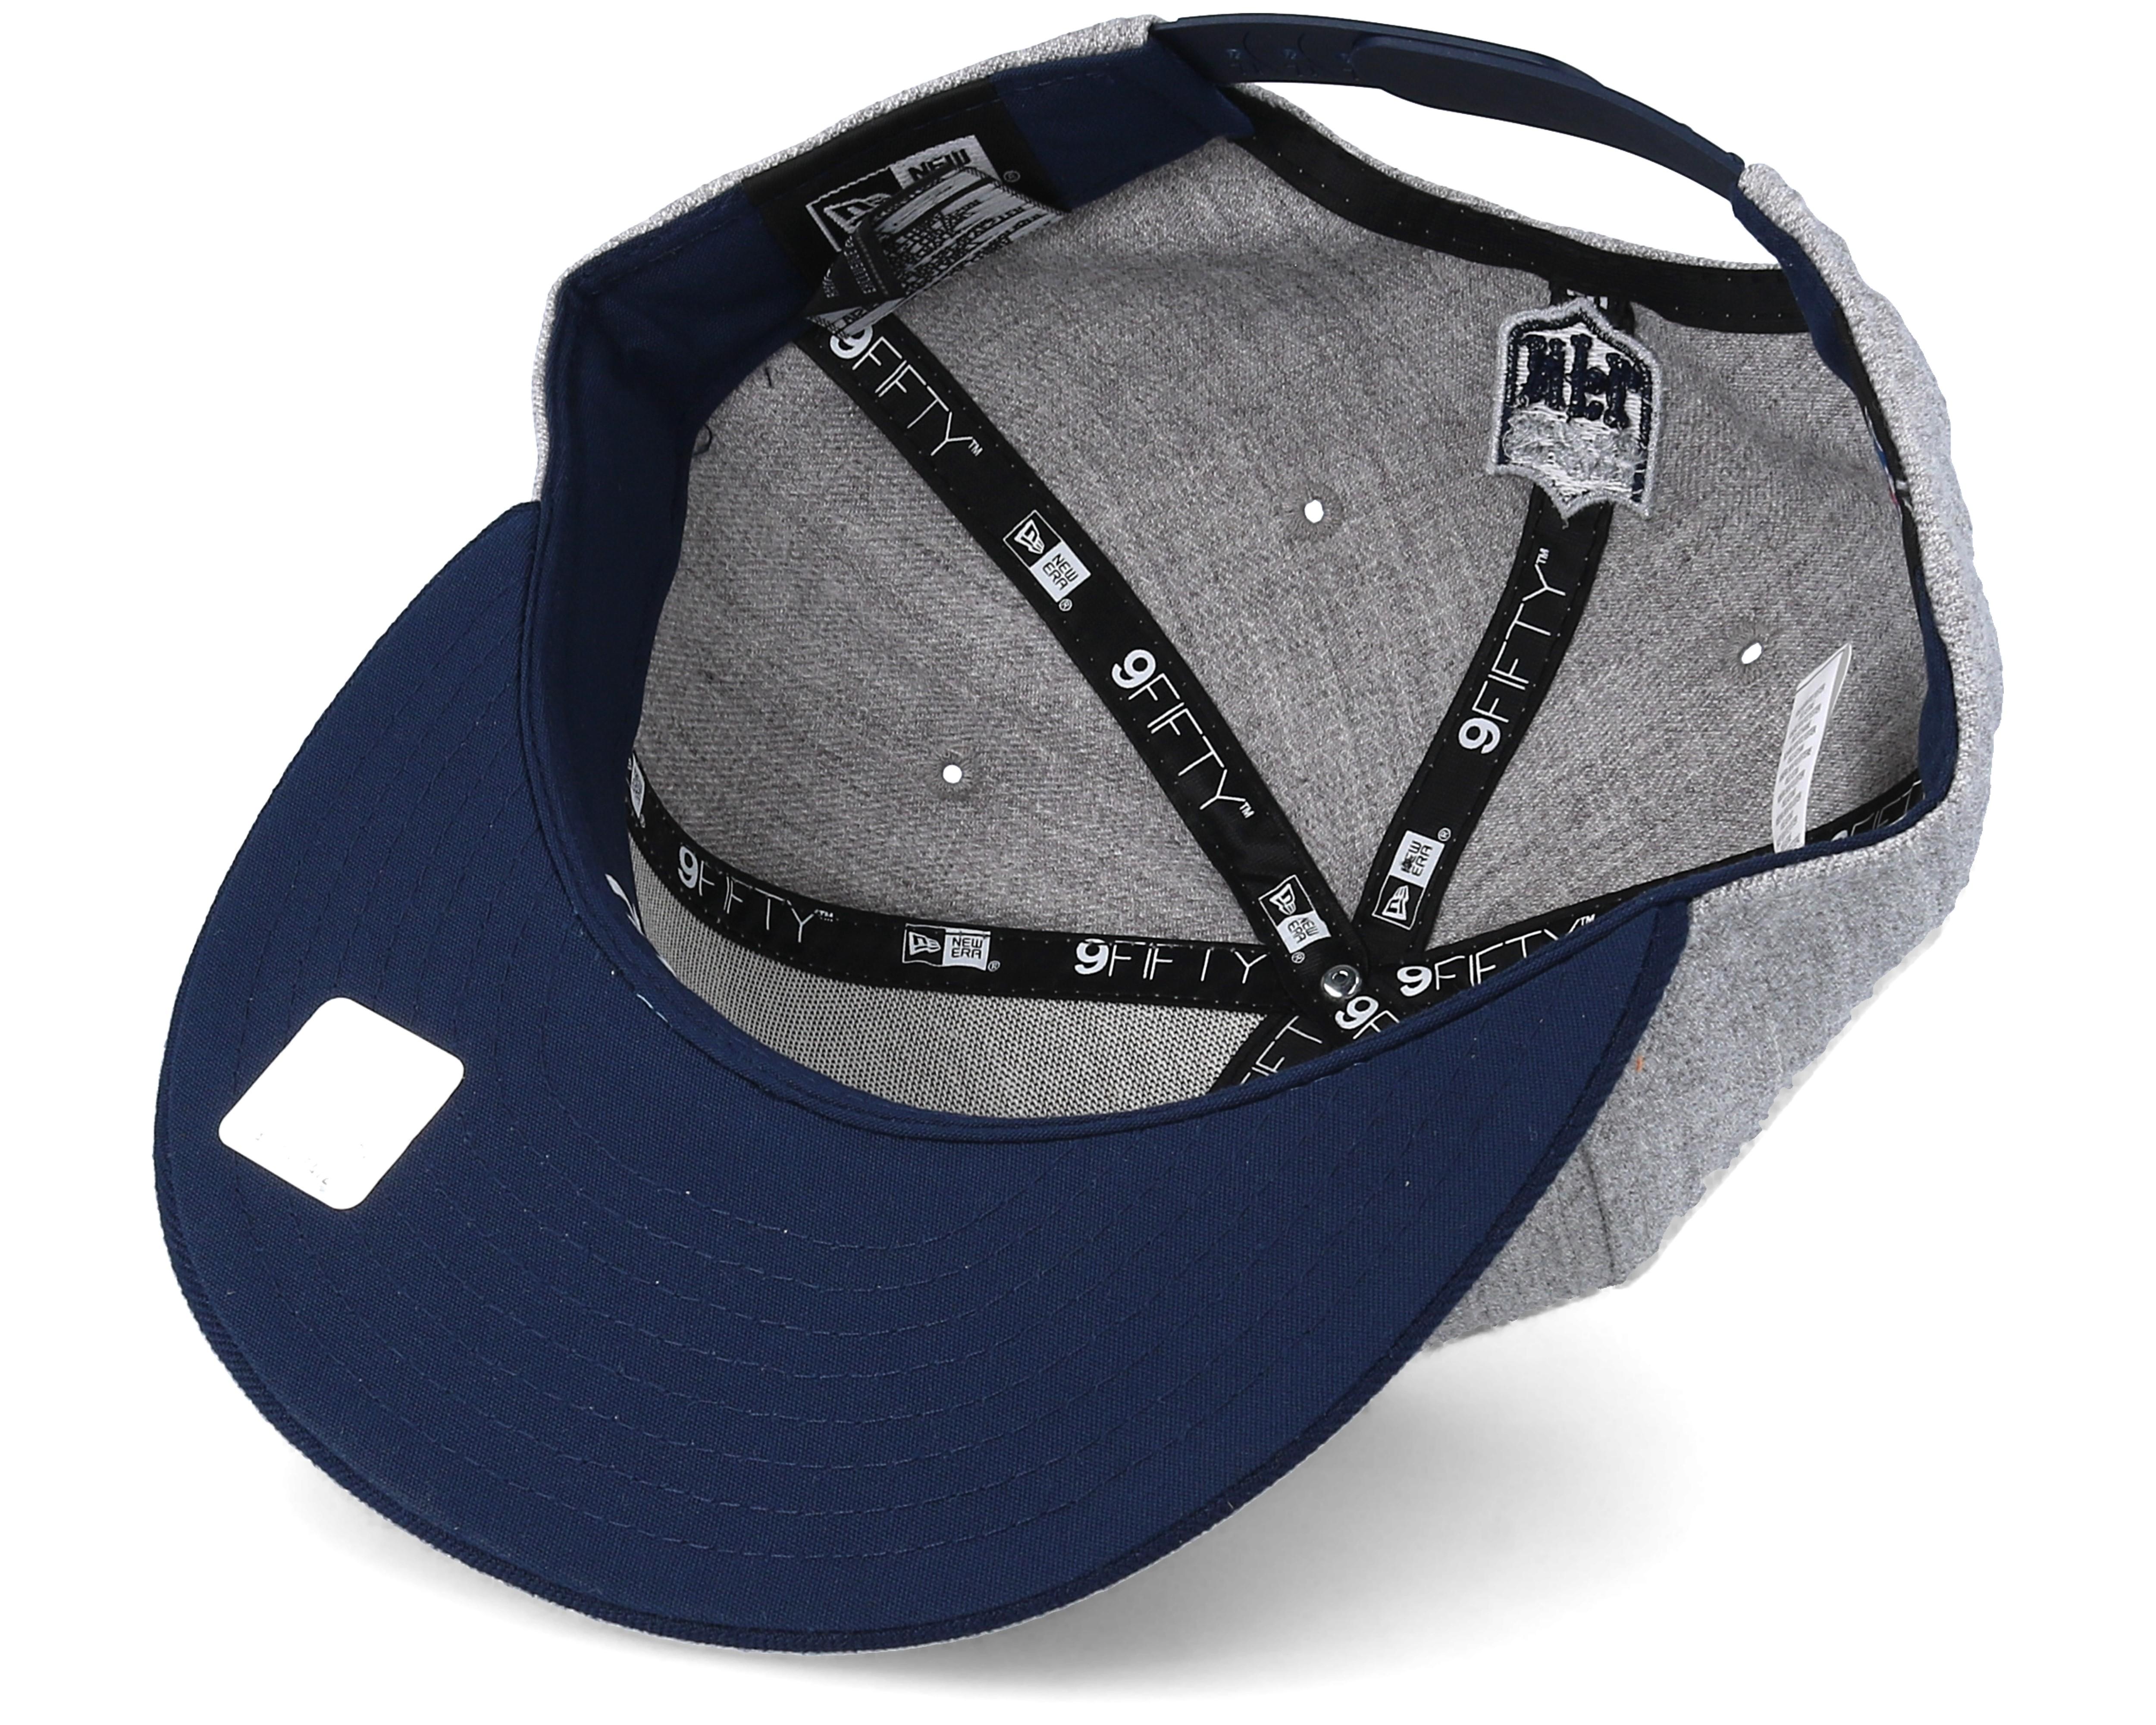 Dallas Cowboys 2018 NFL Draft On-Stage Grey Navy Snapback - New Era ... 61bad1039e09